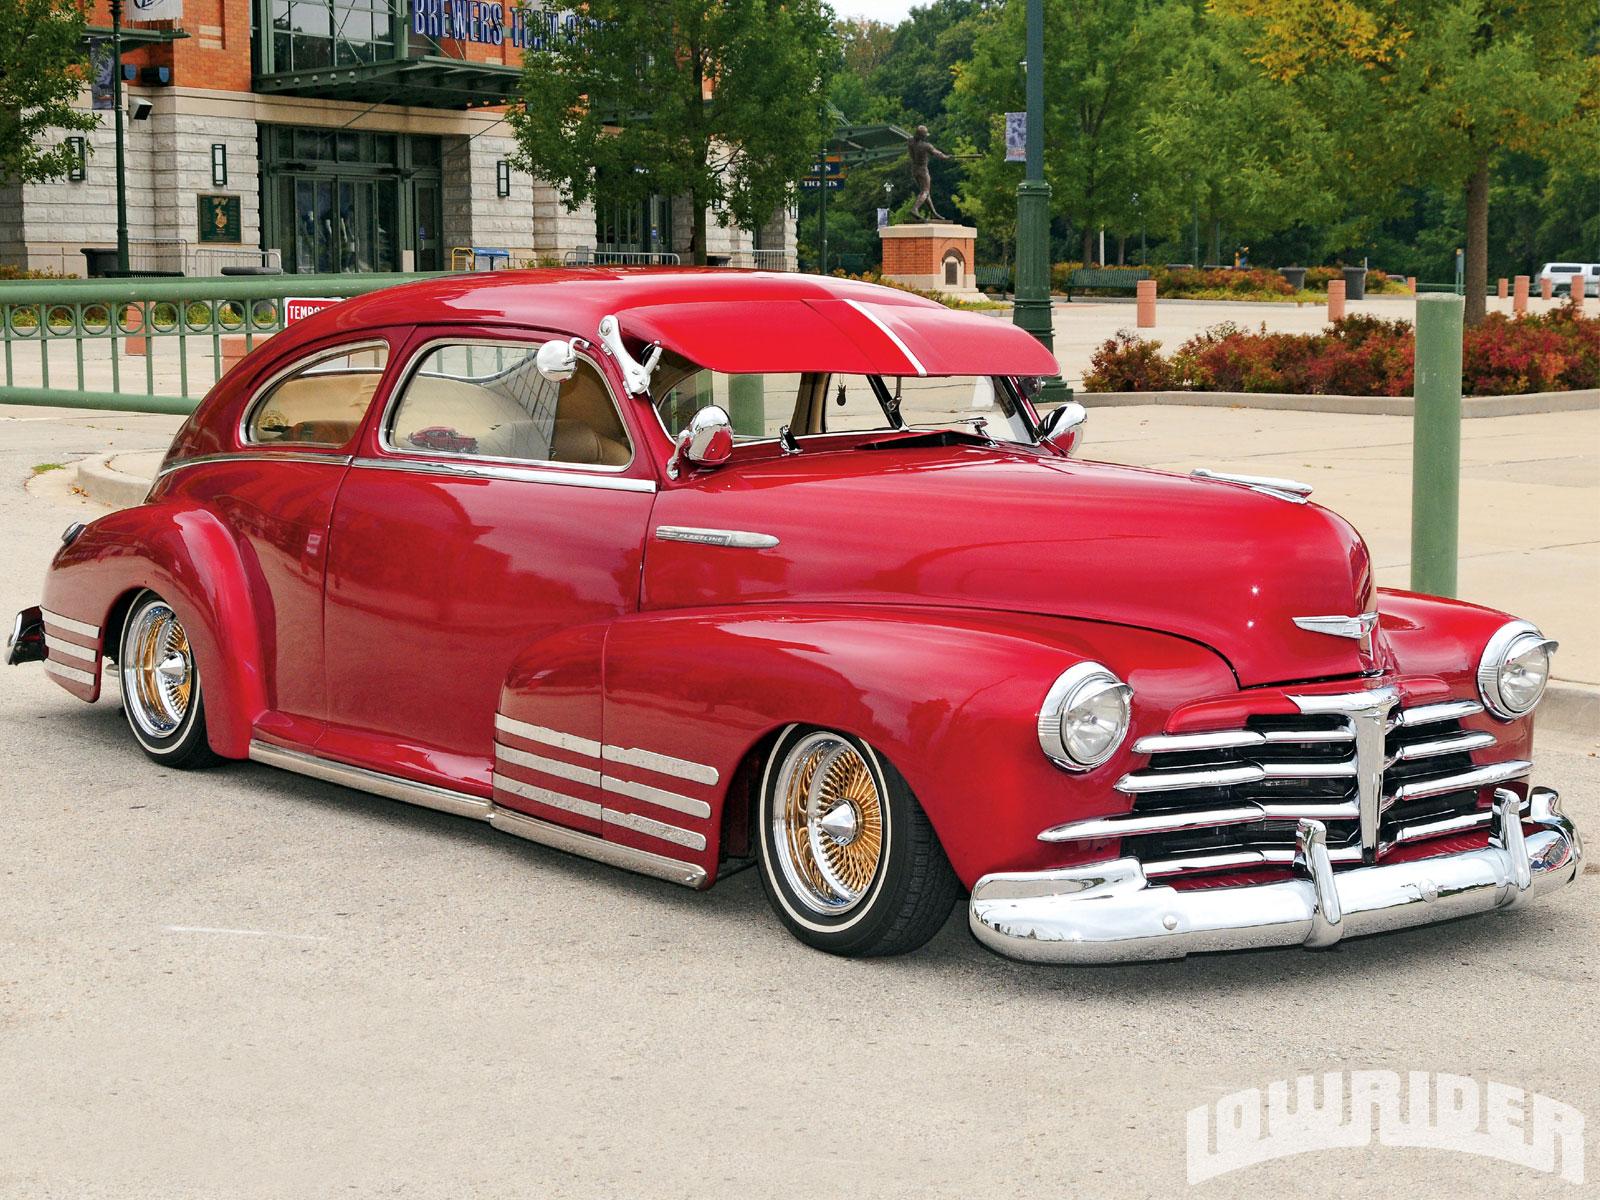 1948 Chevrolet Fleetline Lowrider Magazine